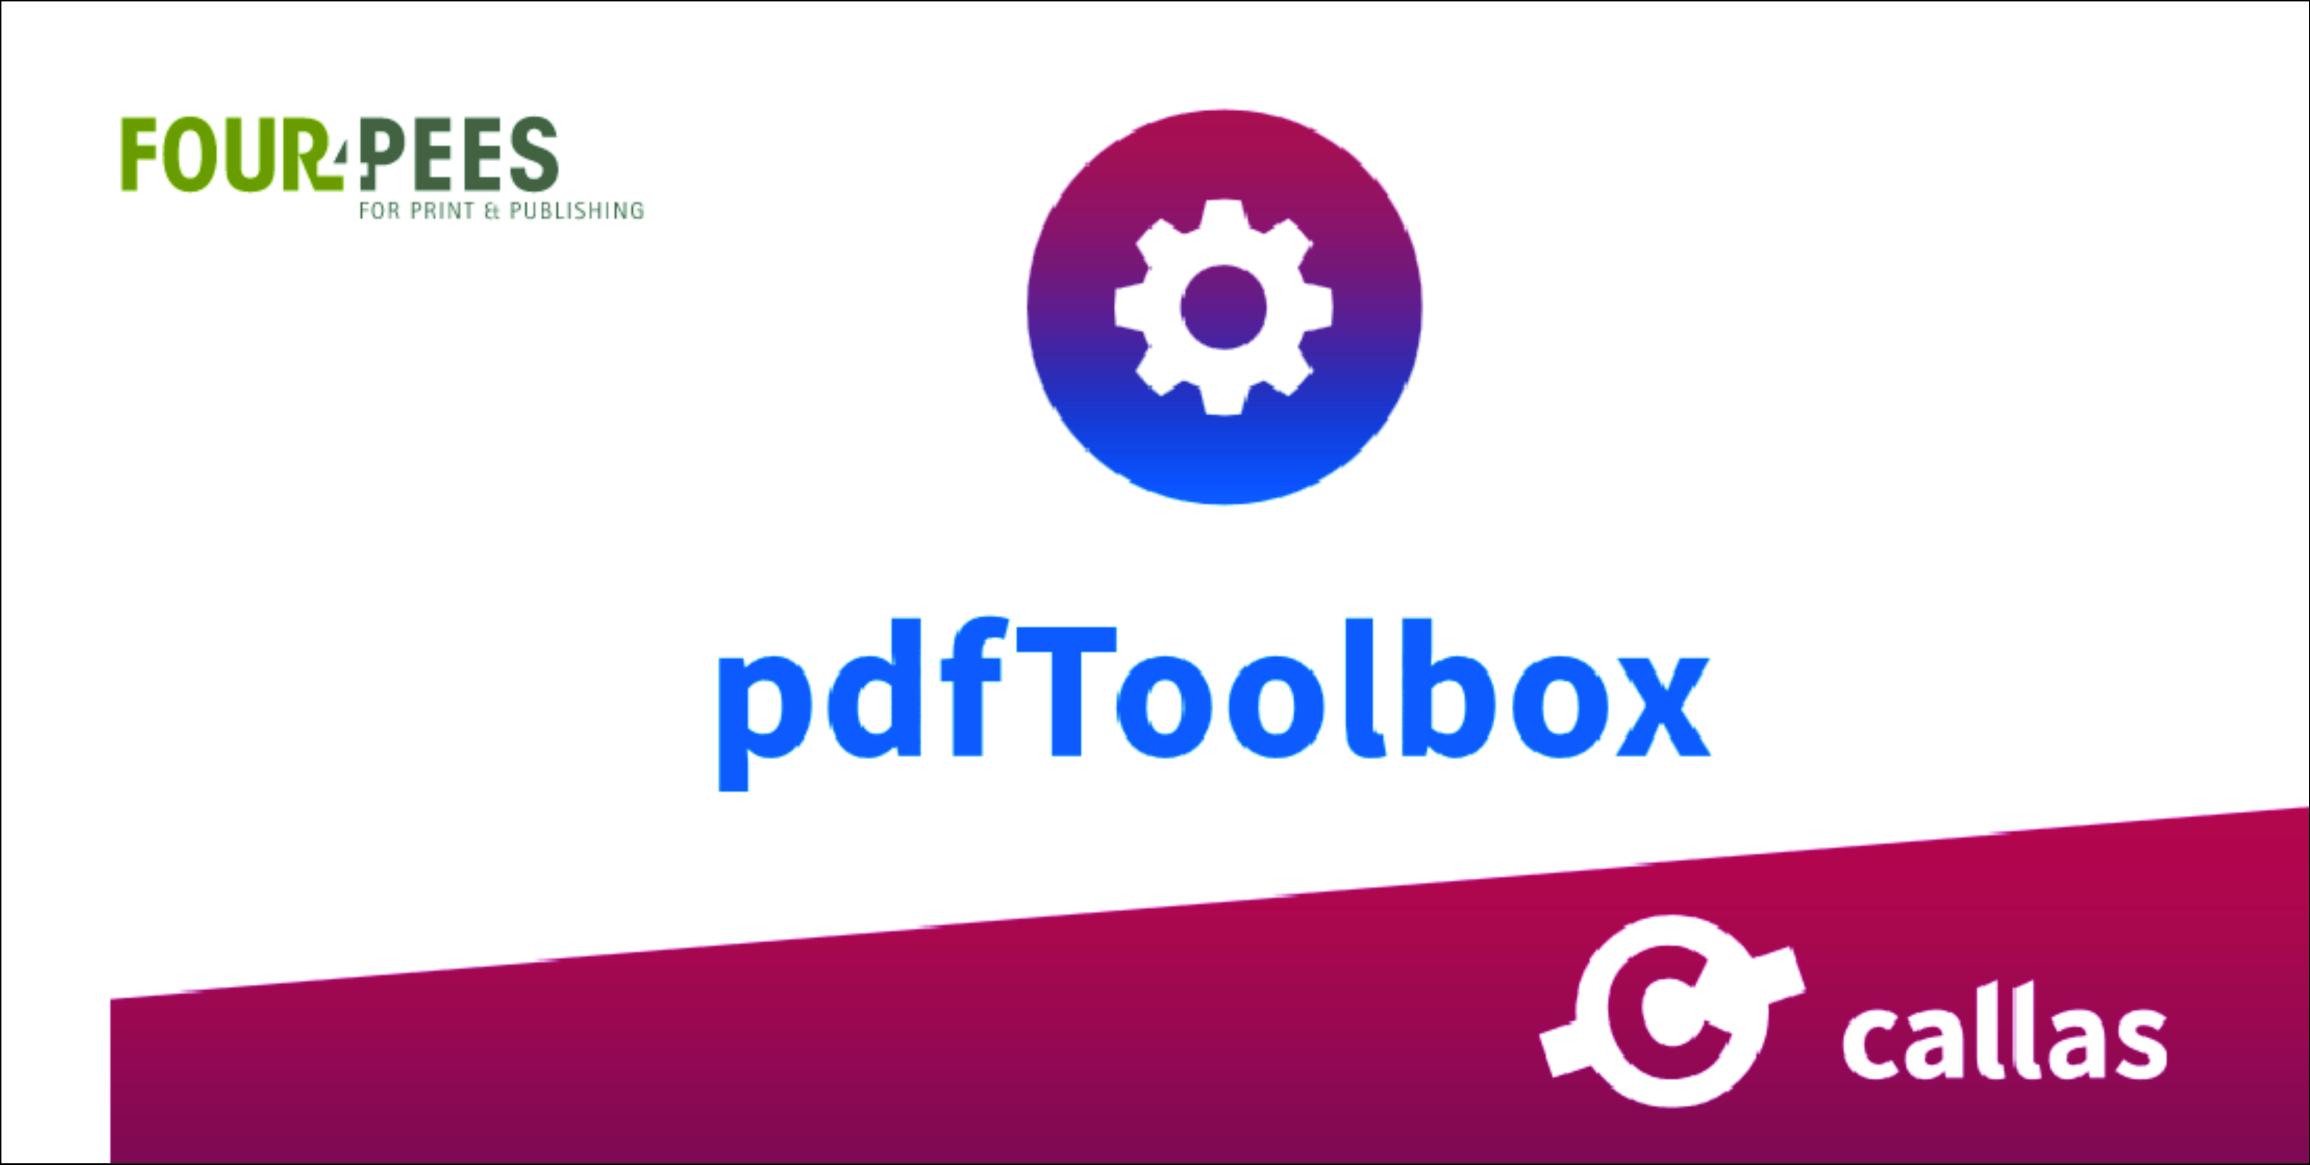 pdfToolbox